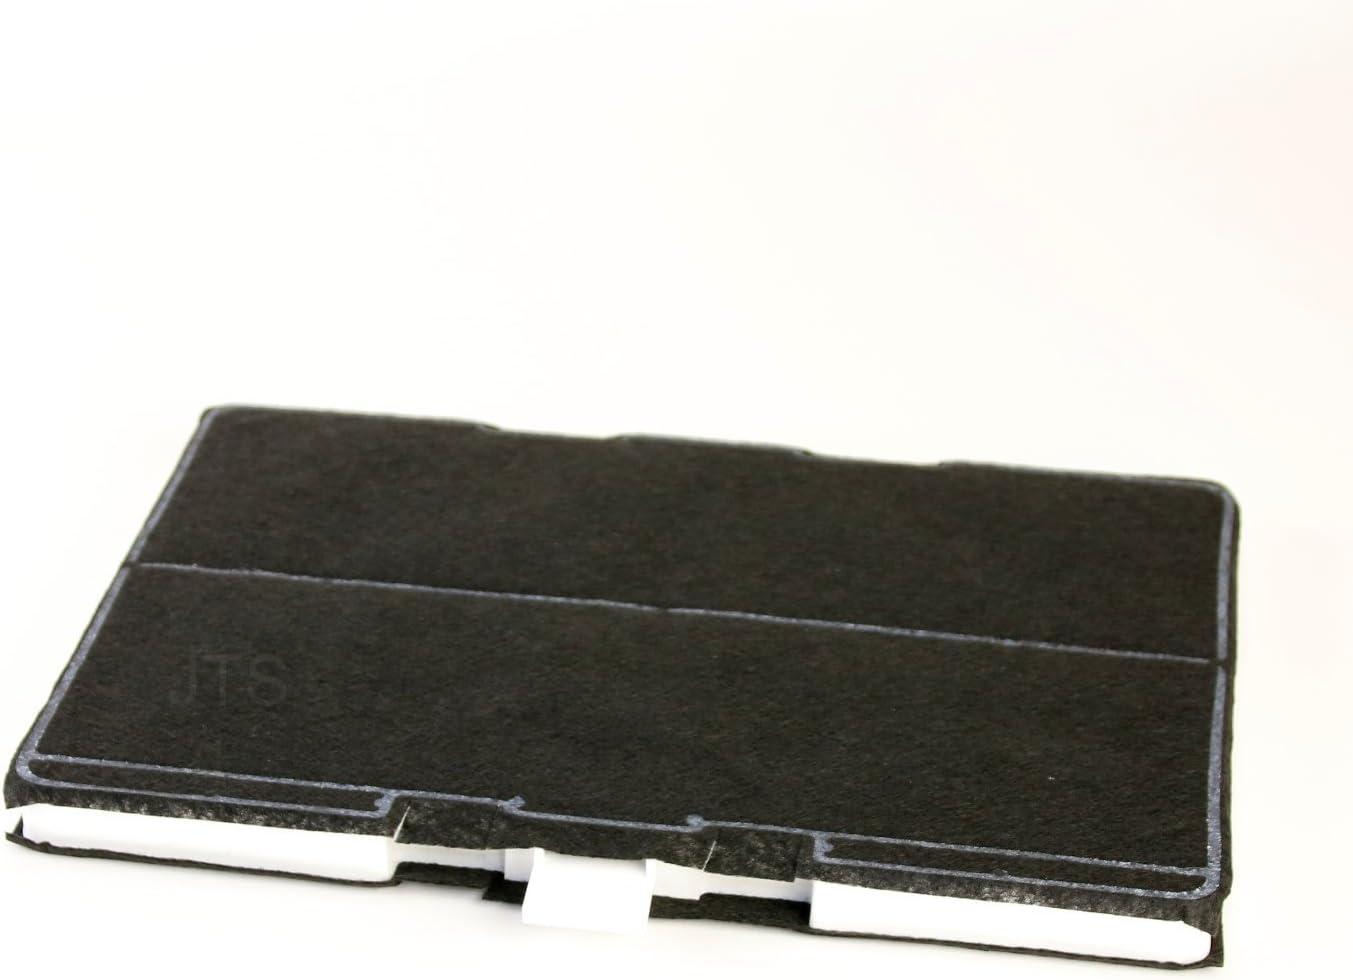 Filtro de carbón activo filtro de carbón para recirculación Alimentado por Campana Repuestos para Bosch DHZ5345, DHZ5346, DHZ5385, DHZ5245, DHZ5246, DHZ5285: Amazon.es: Grandes electrodomésticos